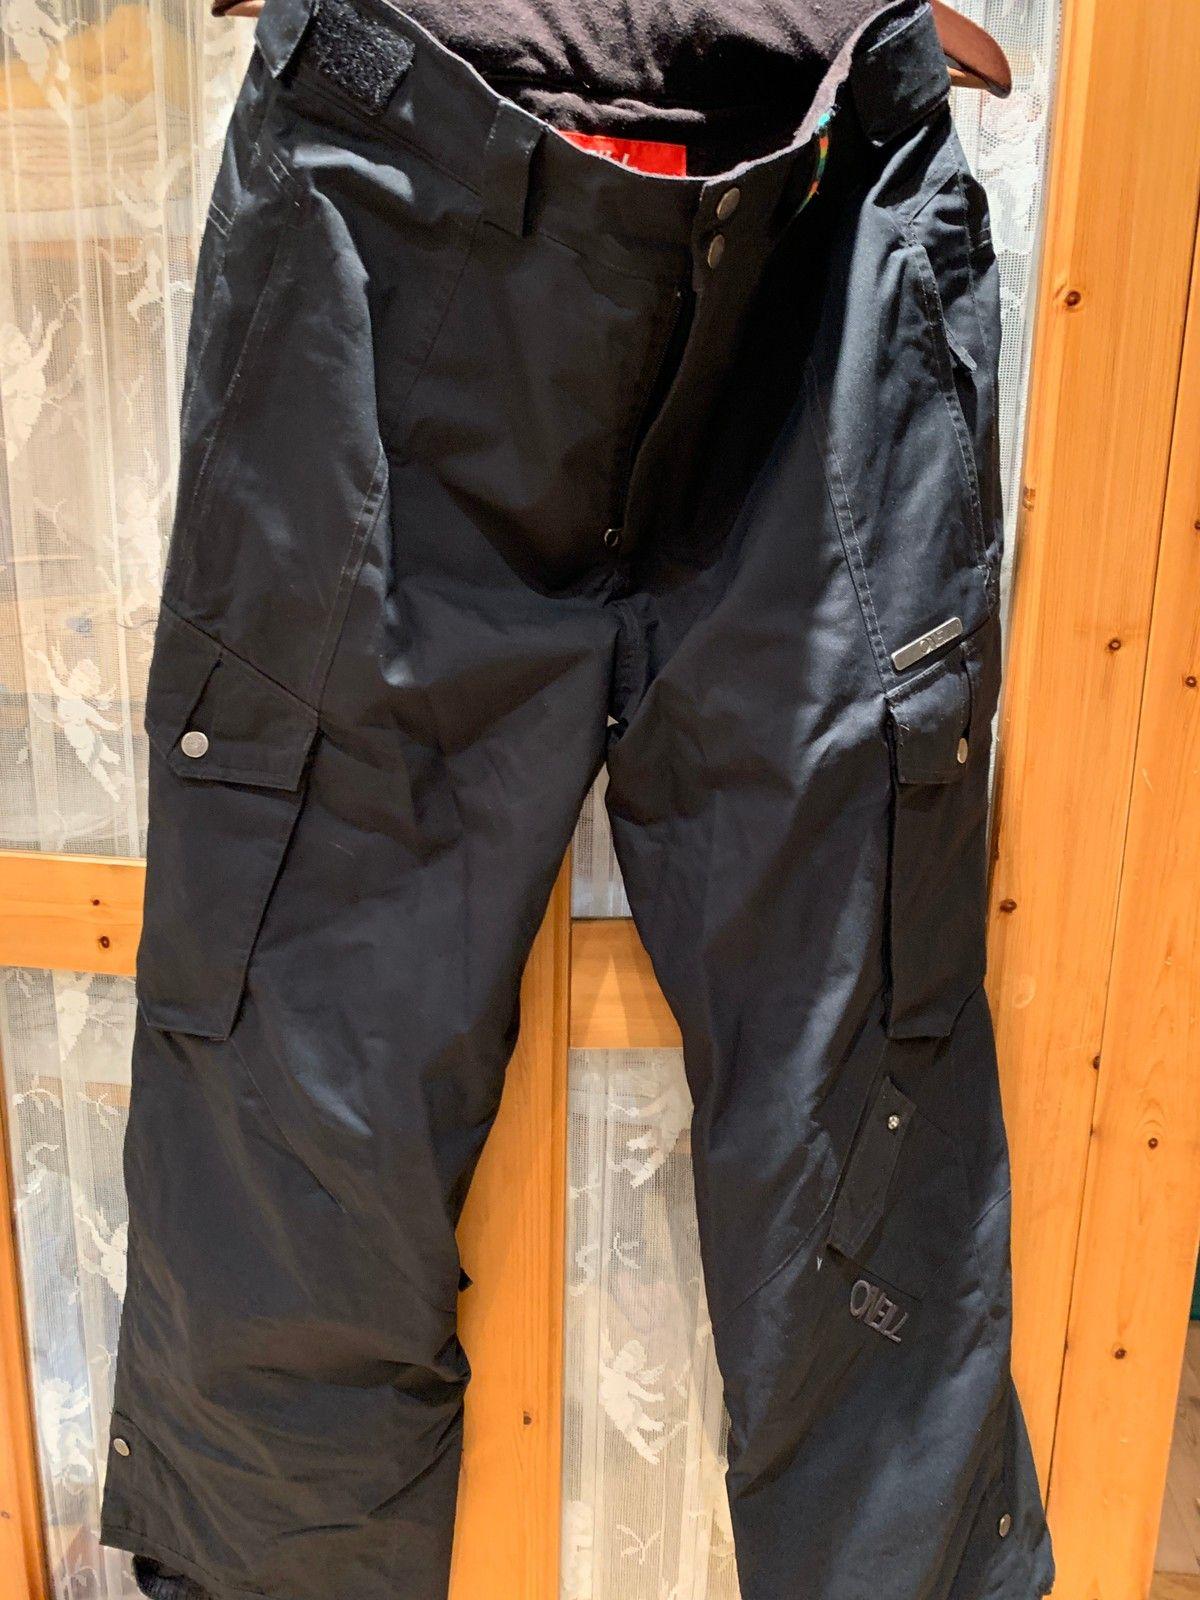 O neil slalom snowboard bukse | FINN.no